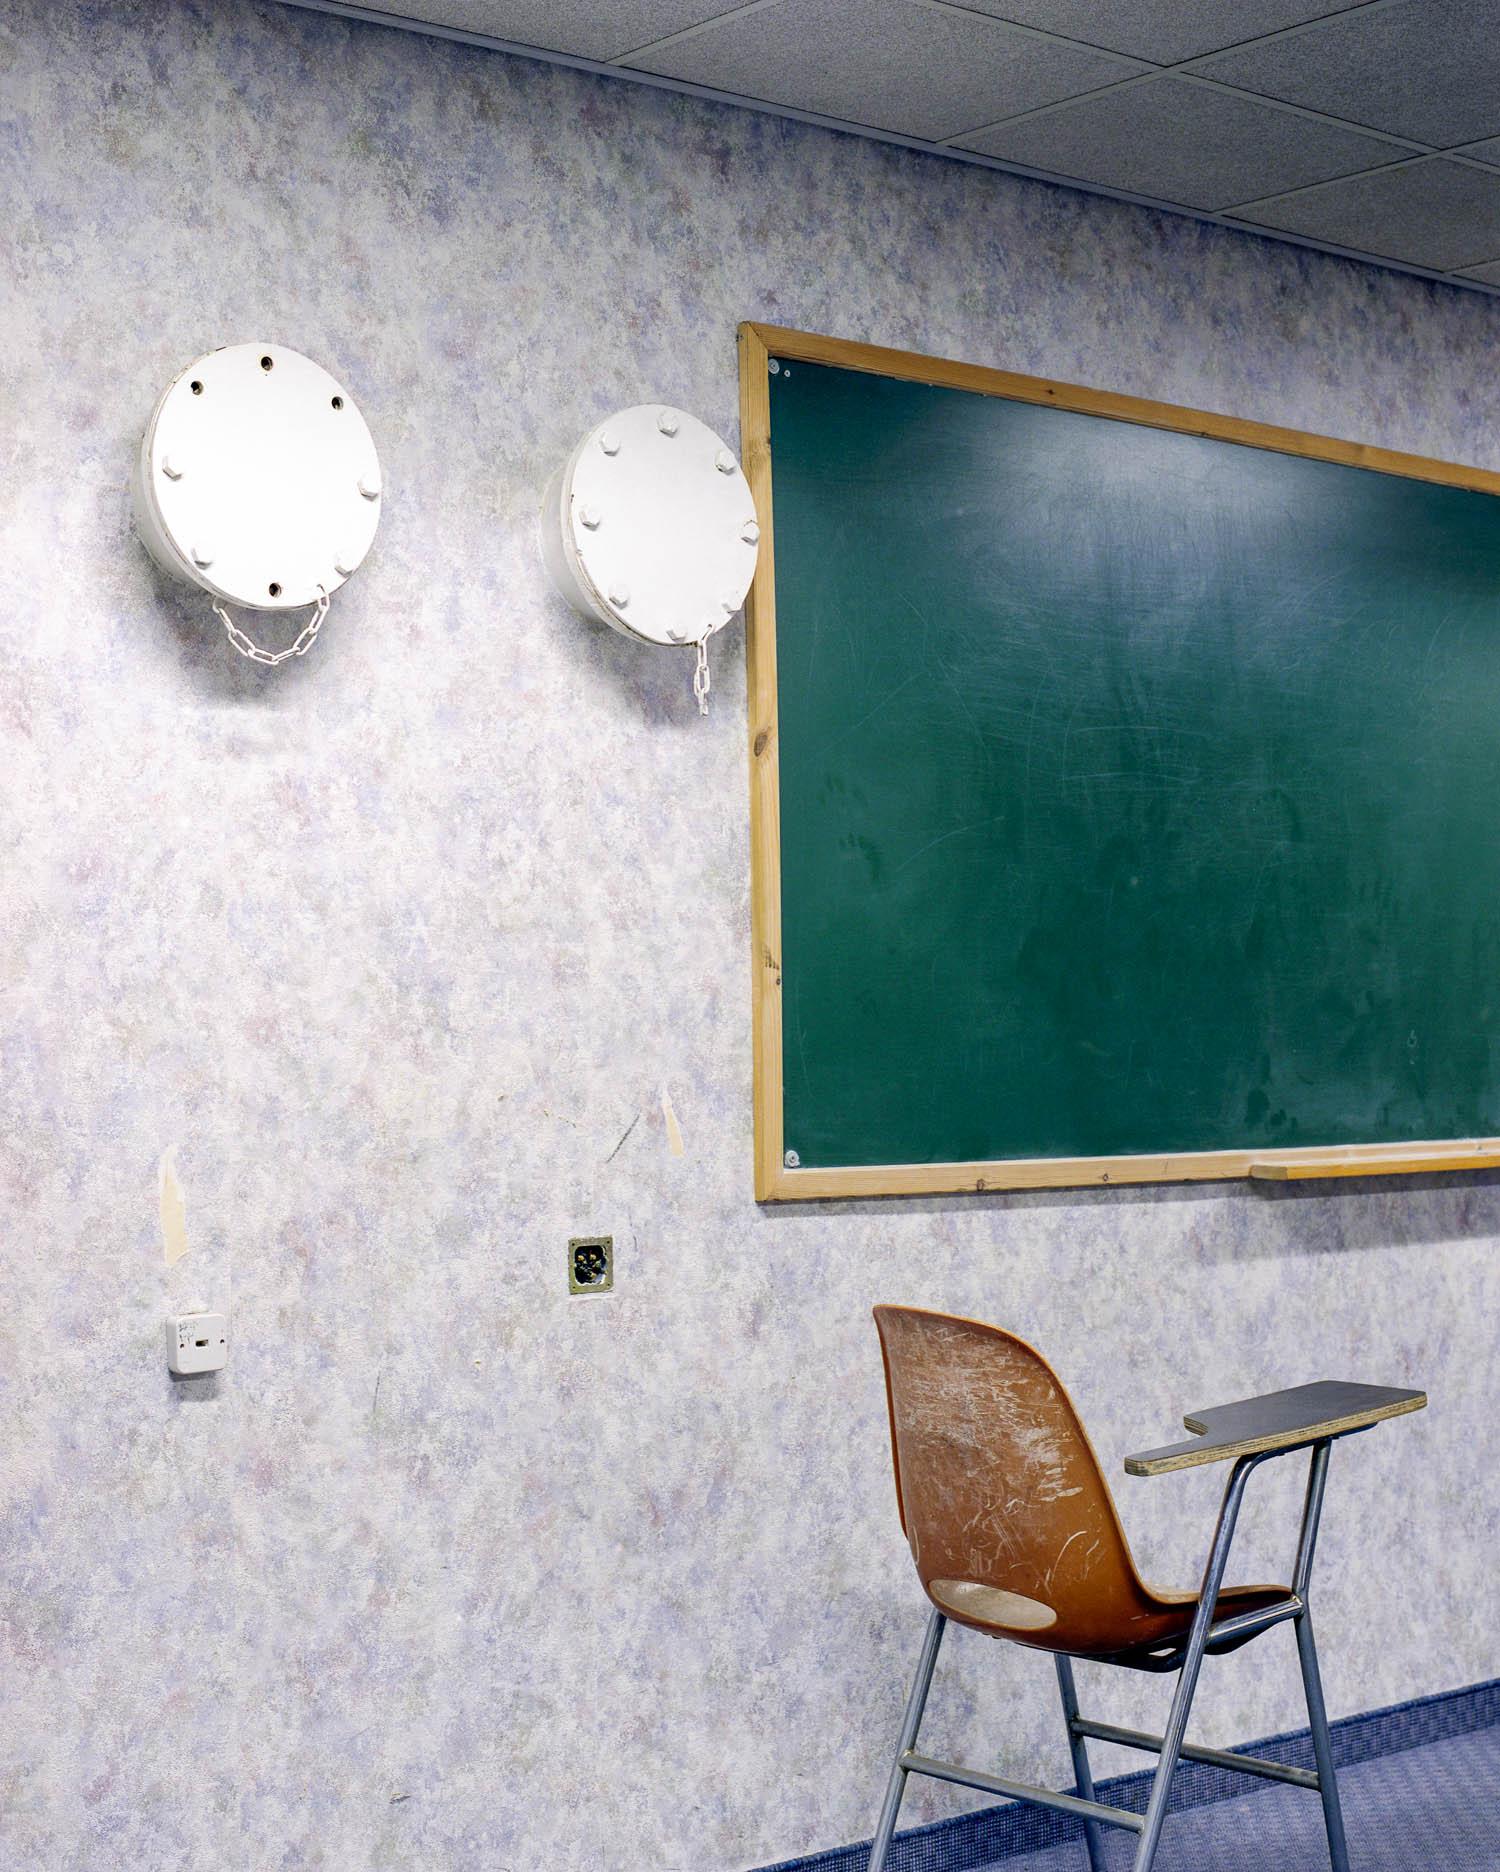 "Classroom, Hebrew University, Mount Scopus,Jerusalem, 2007, Chromogenic print, 30"" x 20"""